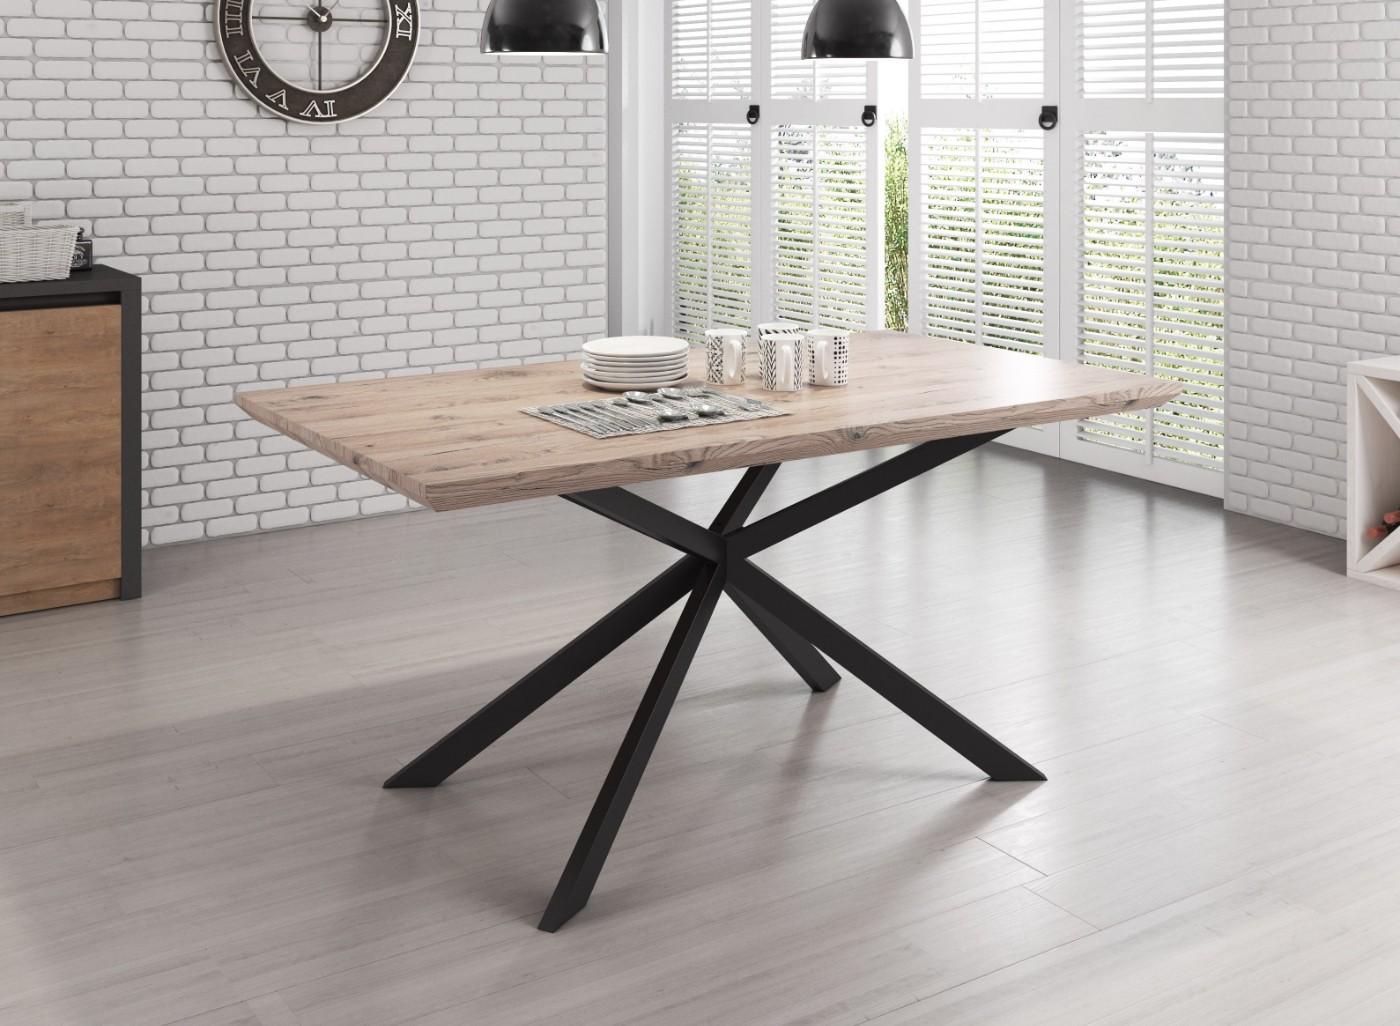 Licht Eiken Eettafel : Eetkamertafel cormac 160 licht eiken zwart showroommodel